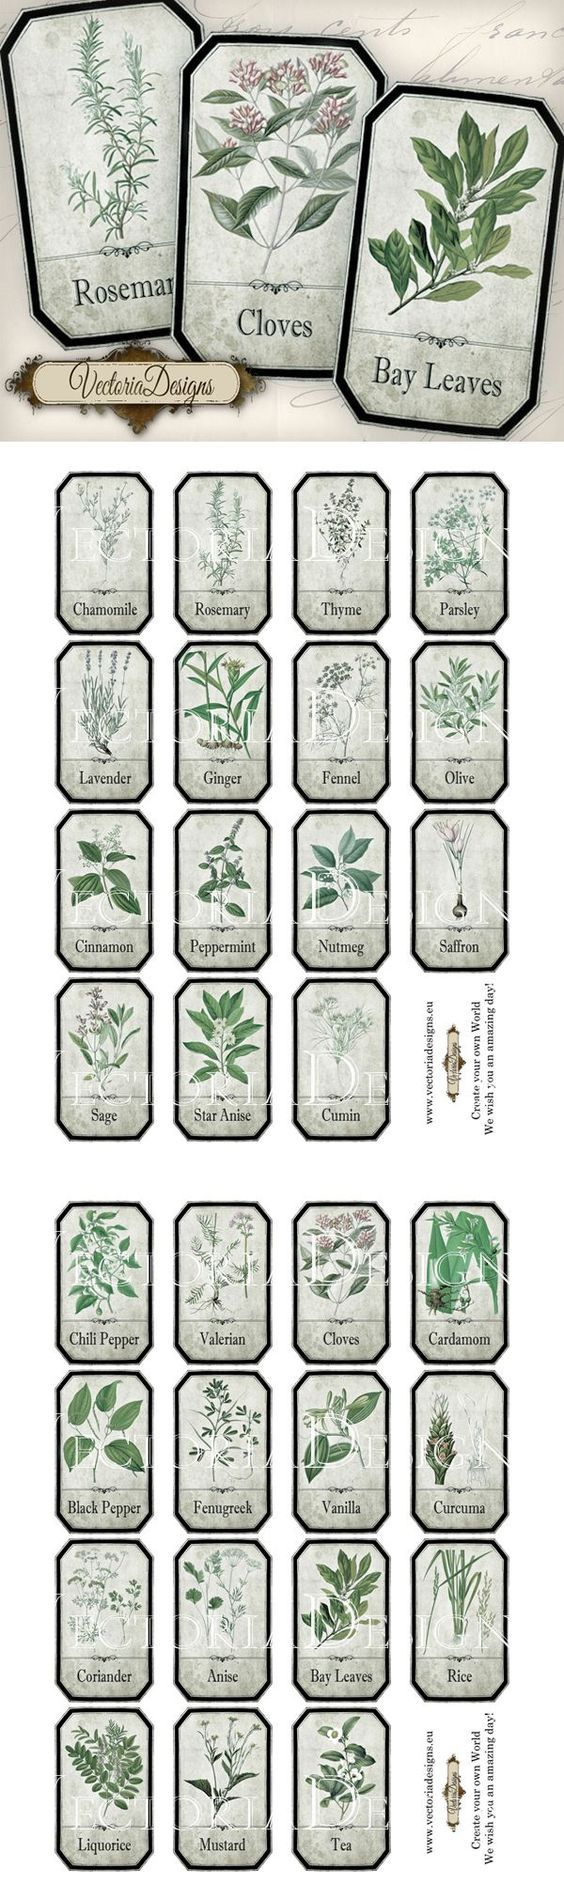 Printable Shabby Herbal Labels by VectoriaDesigns.deviantart.com on @deviantART | herbology, herbalism, healing plants, herbal medicine: